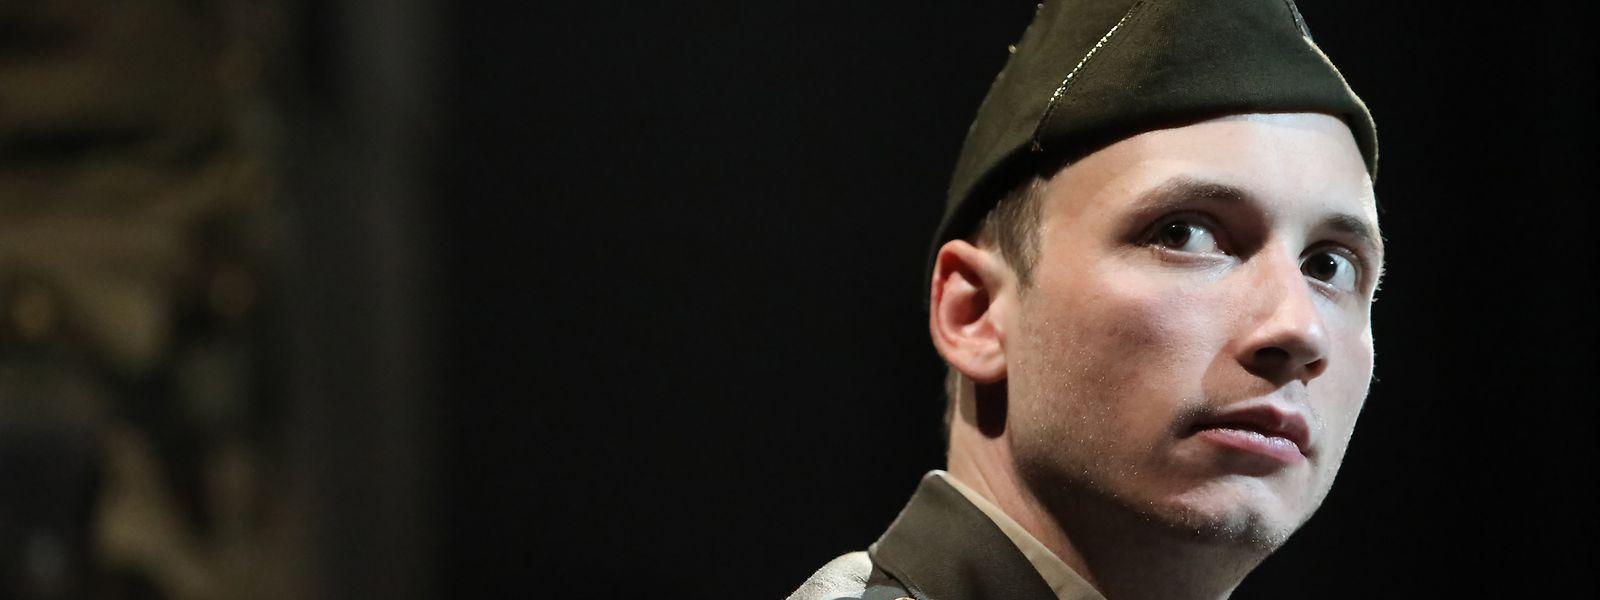 Maximilian Jadin in der Rolle des jungen US-Offiziers John E. Dolibois.